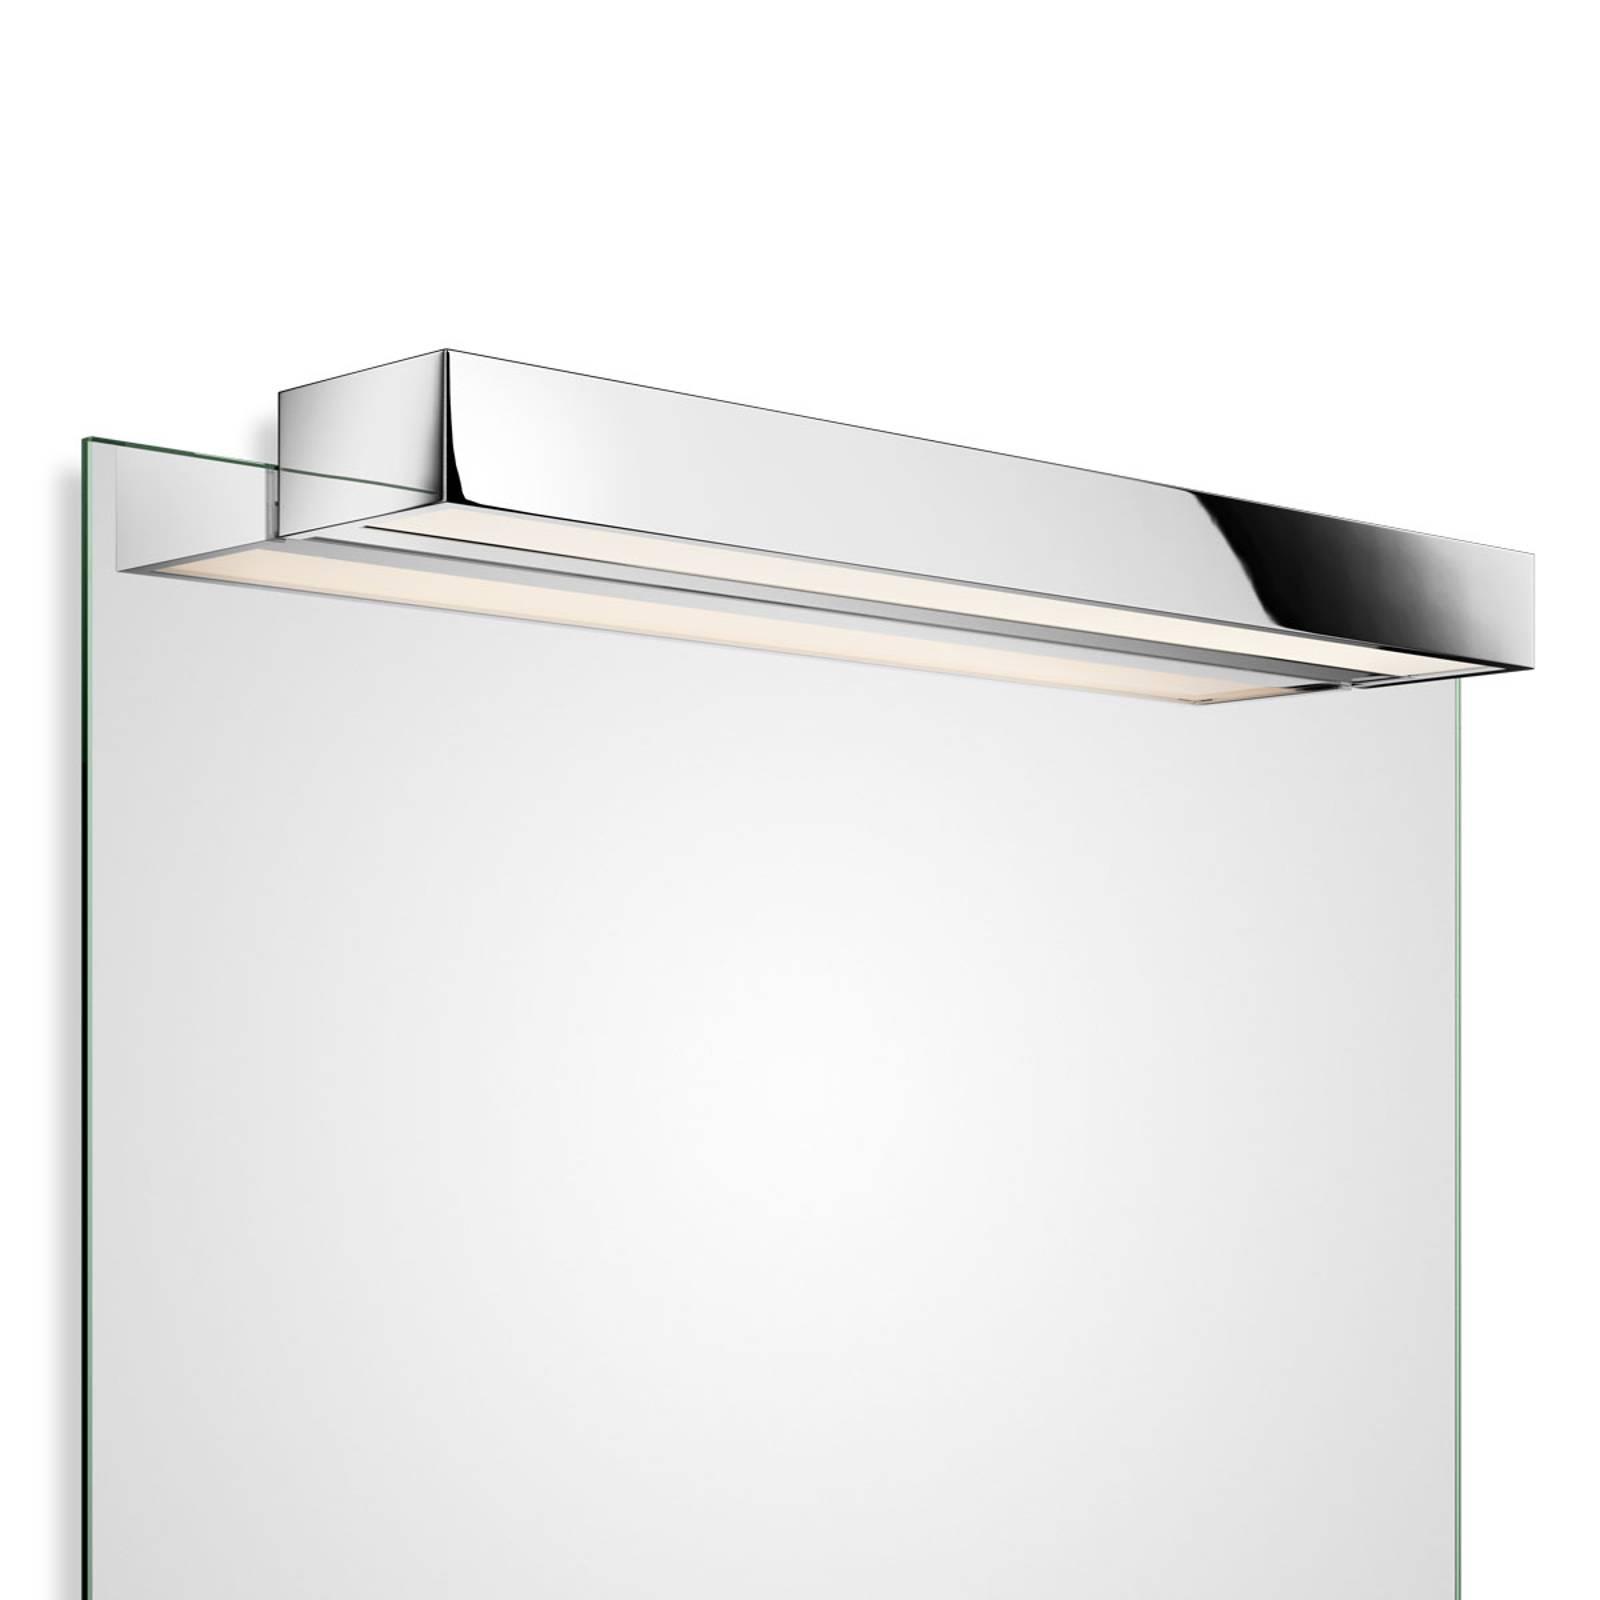 Decor Walther Box 1-60 N -LED-peililamppu 2 700 K